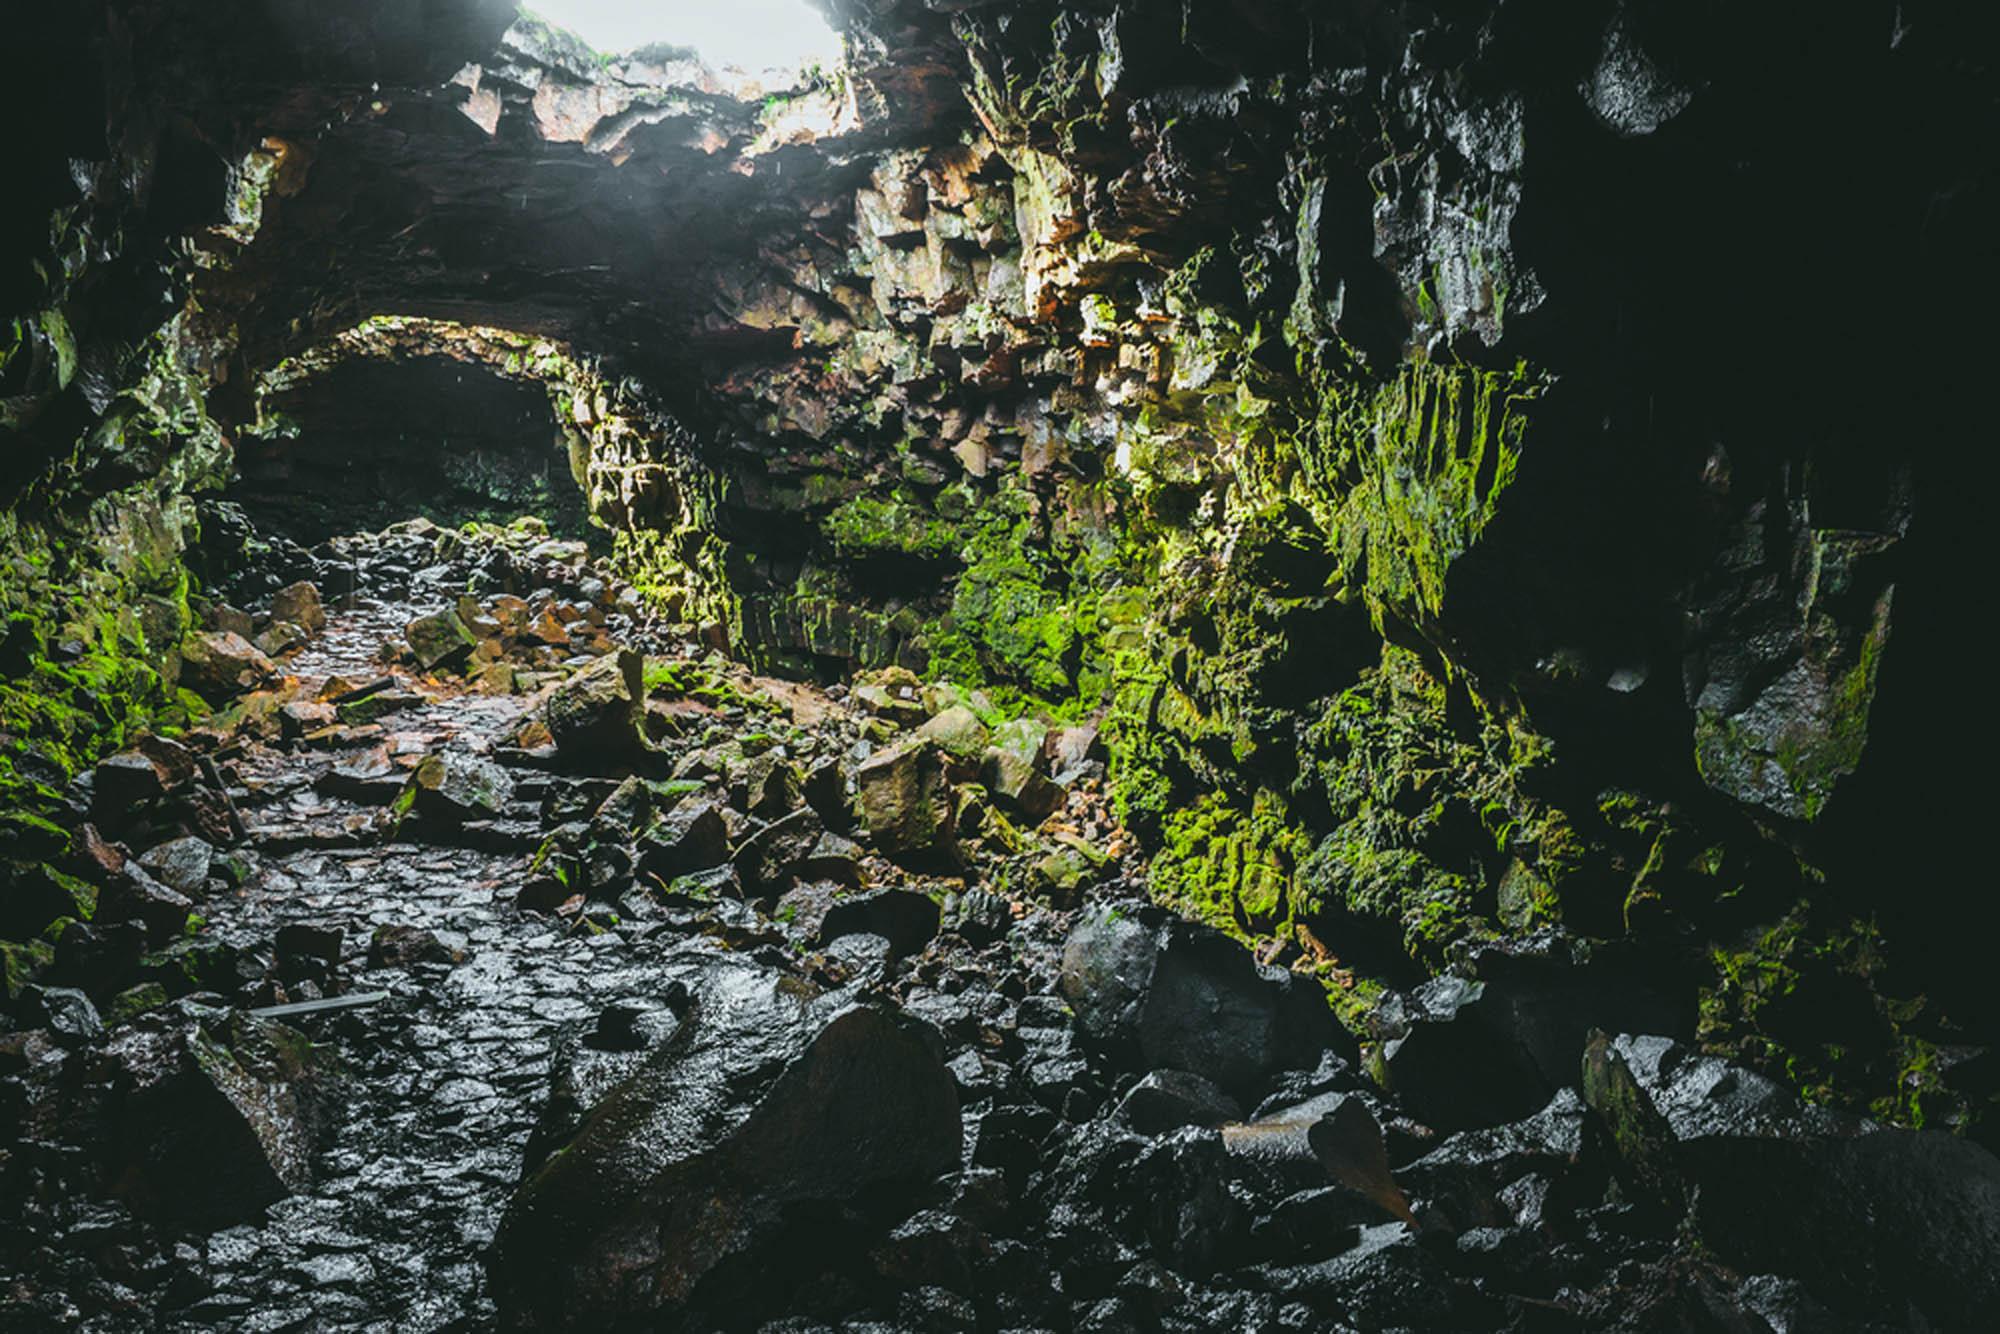 Raufarholshellir Cave - Lava tunnel tour Iceland